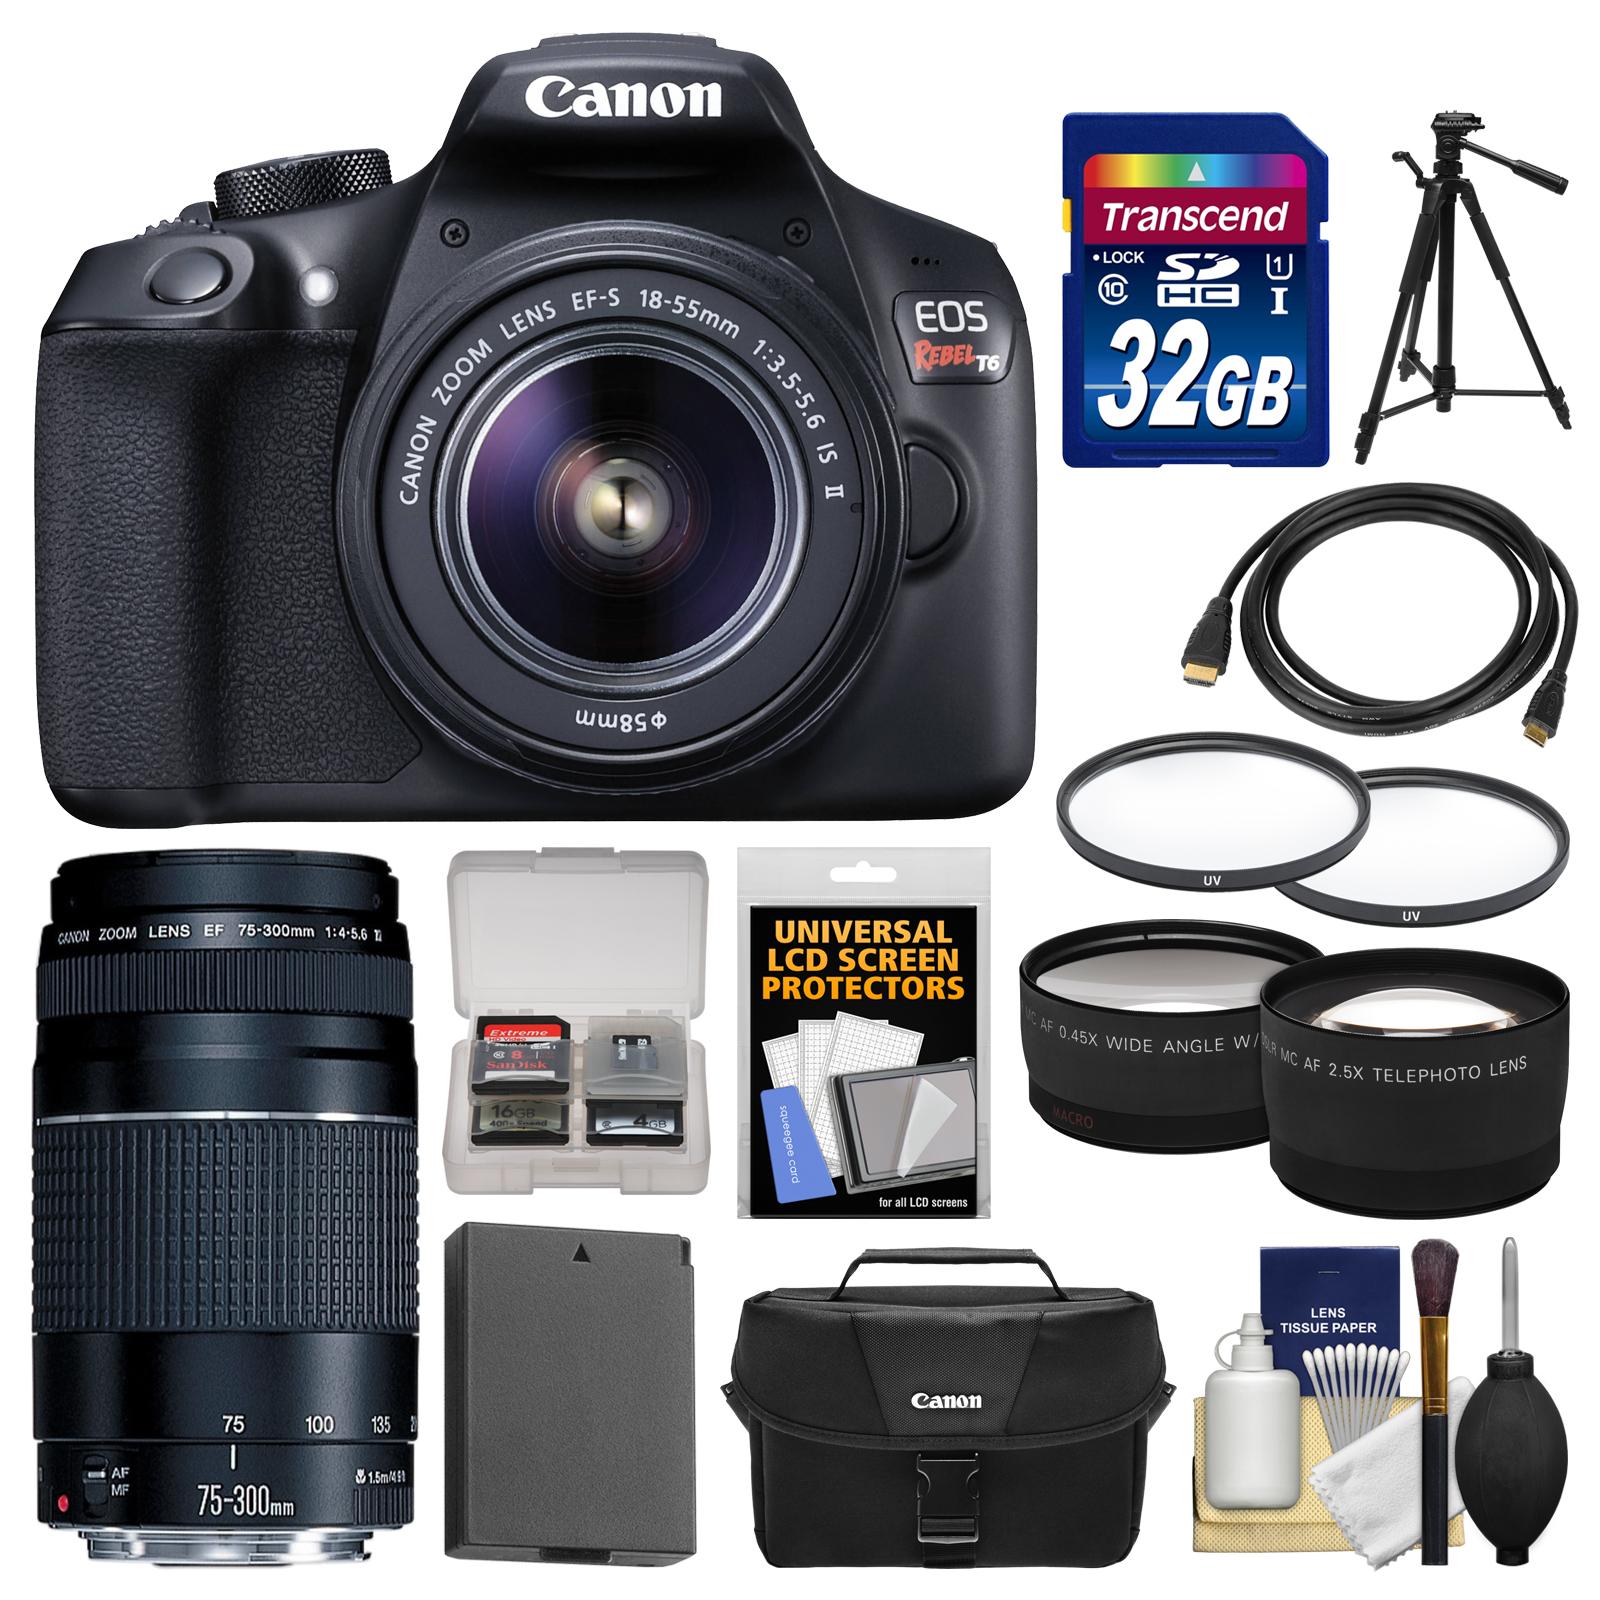 Canon EOS Rebel T6 Wi - Fi Digital SLR Camera & EF - S 18 - 55mm IS II with 75 - 300mm III Lens + 32GB Card + Case + Battery + Tele / Wide Lens Kit